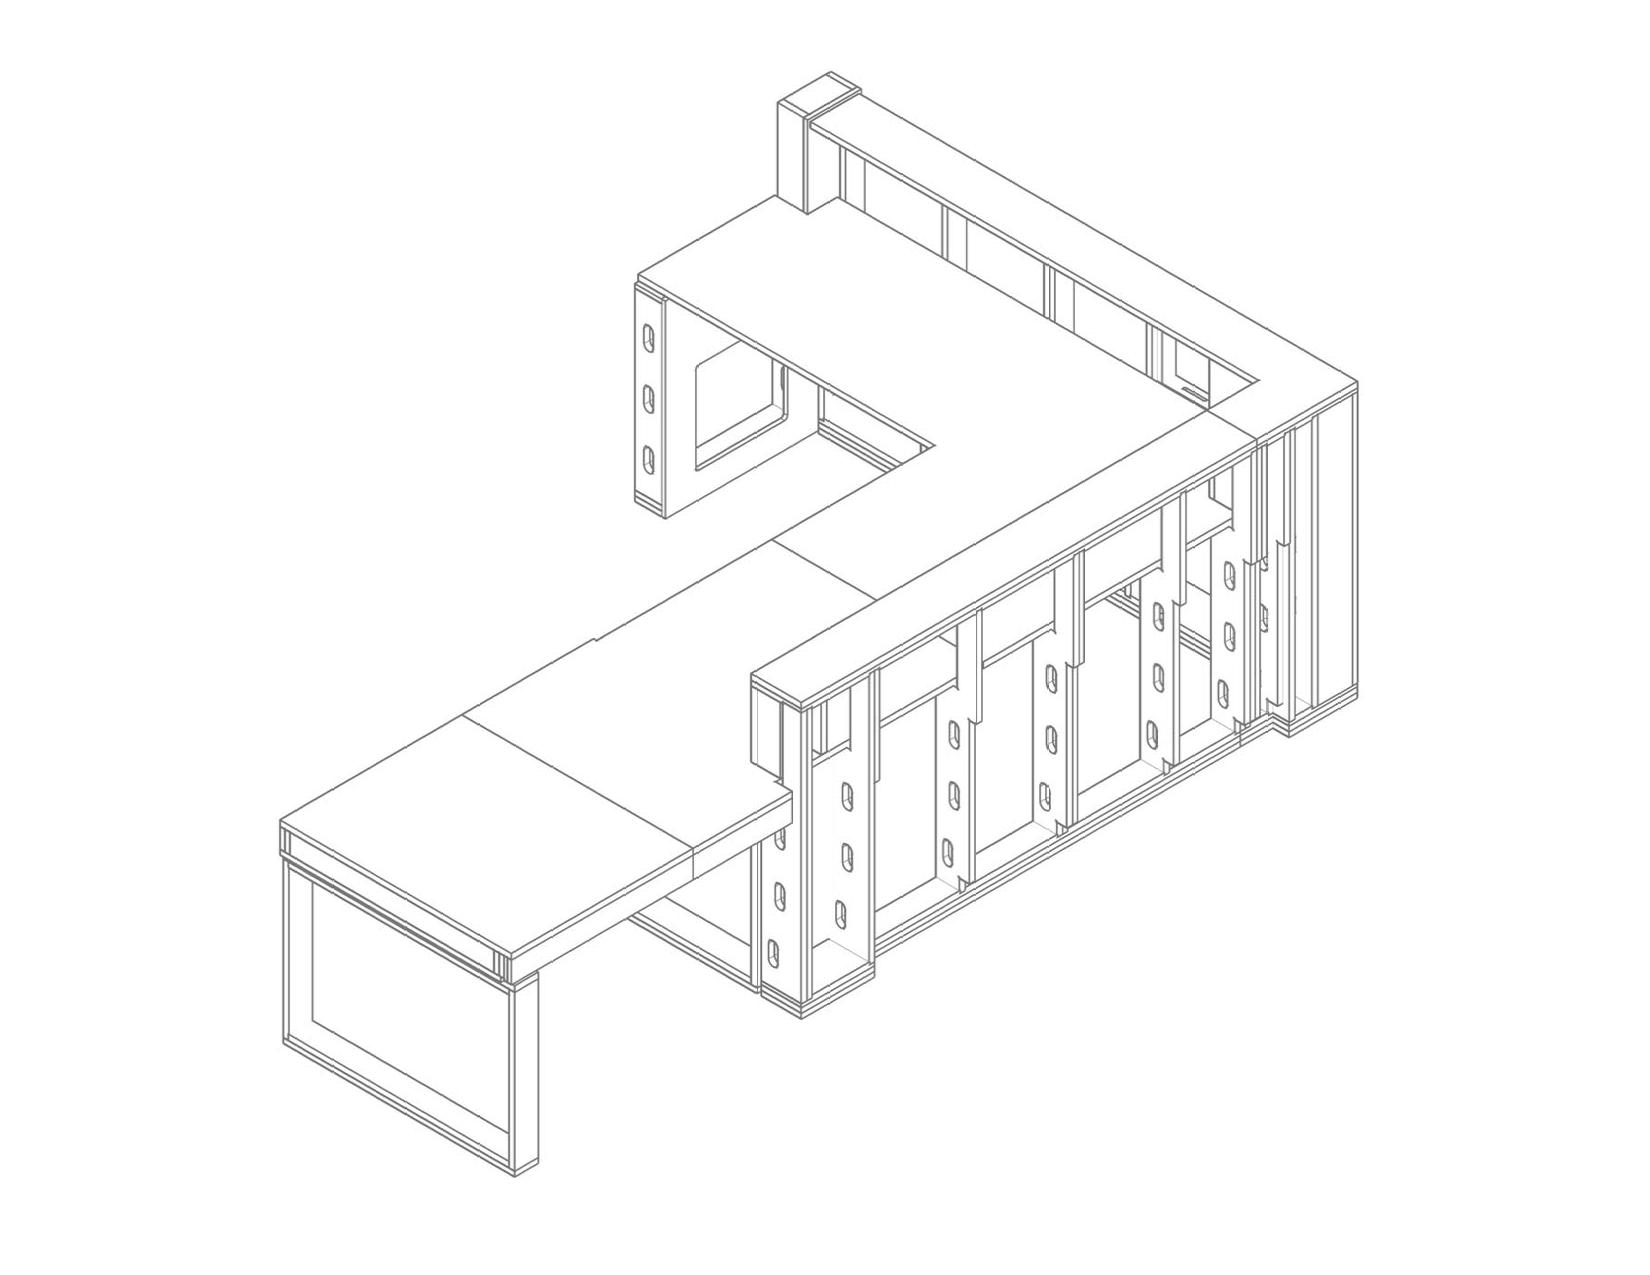 Internal frame